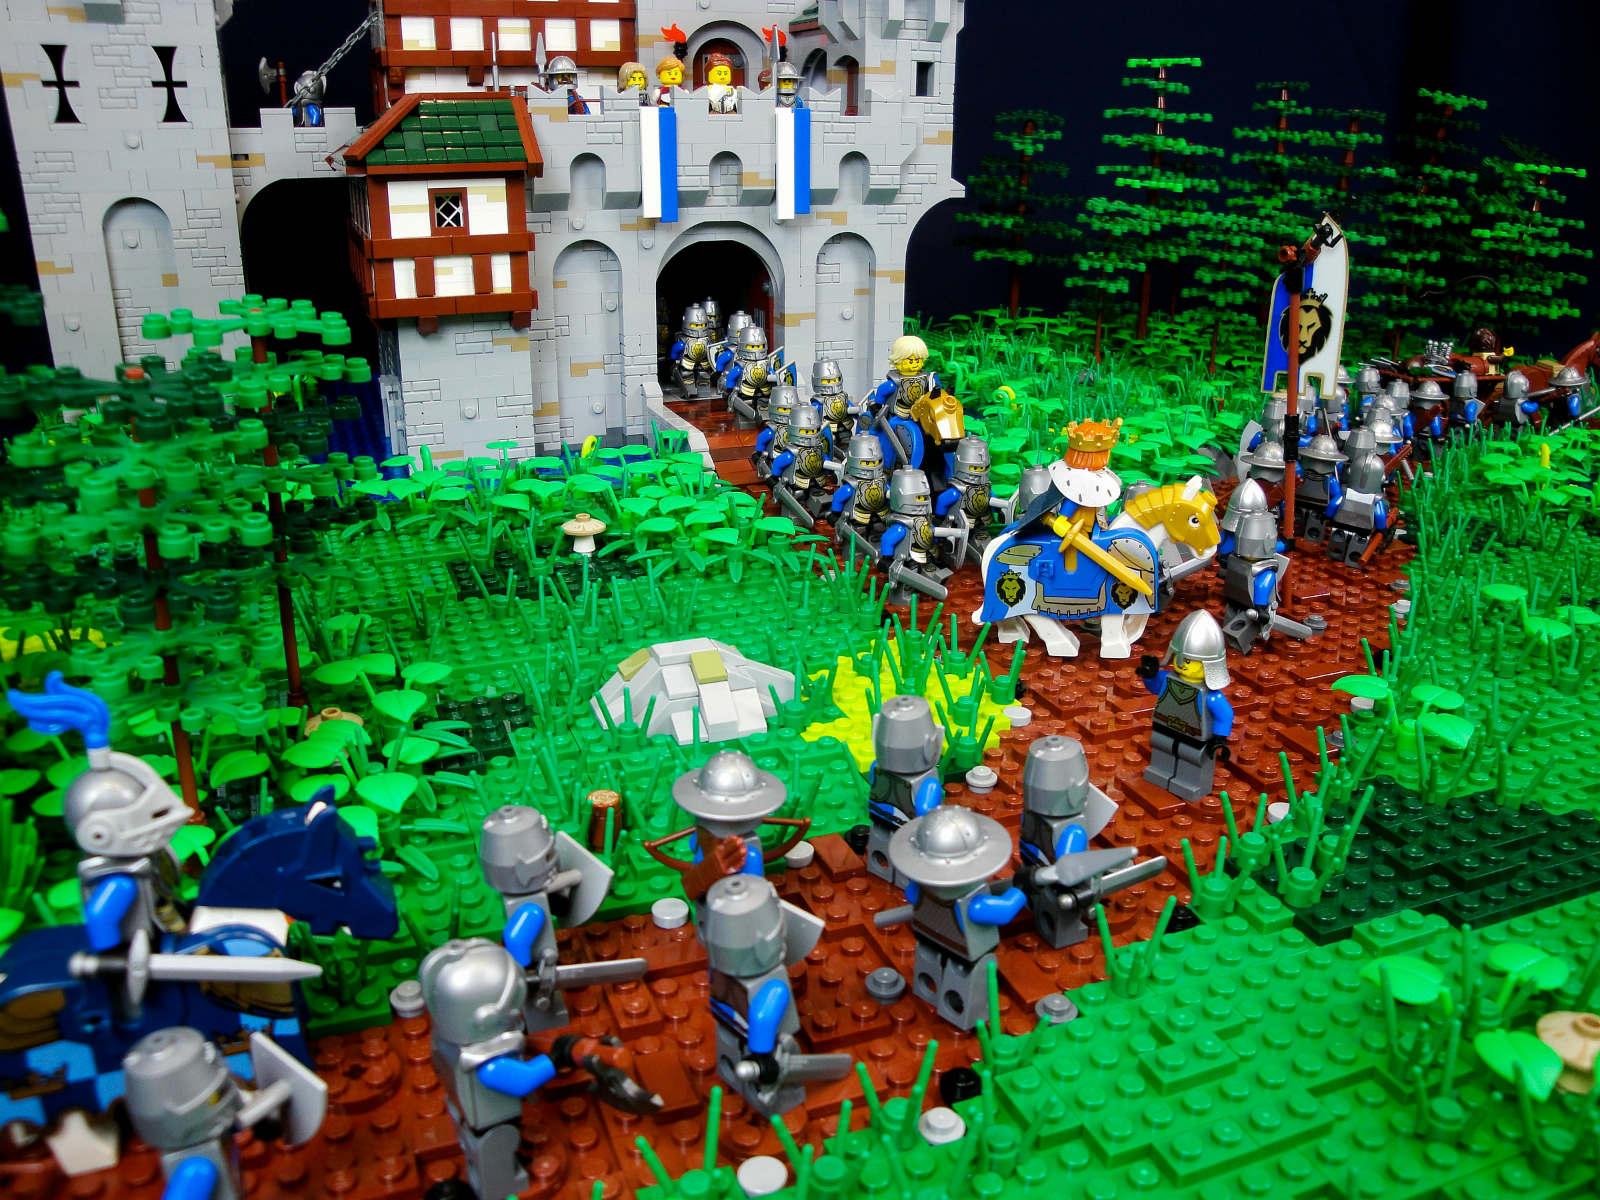 lego moc medieval castle